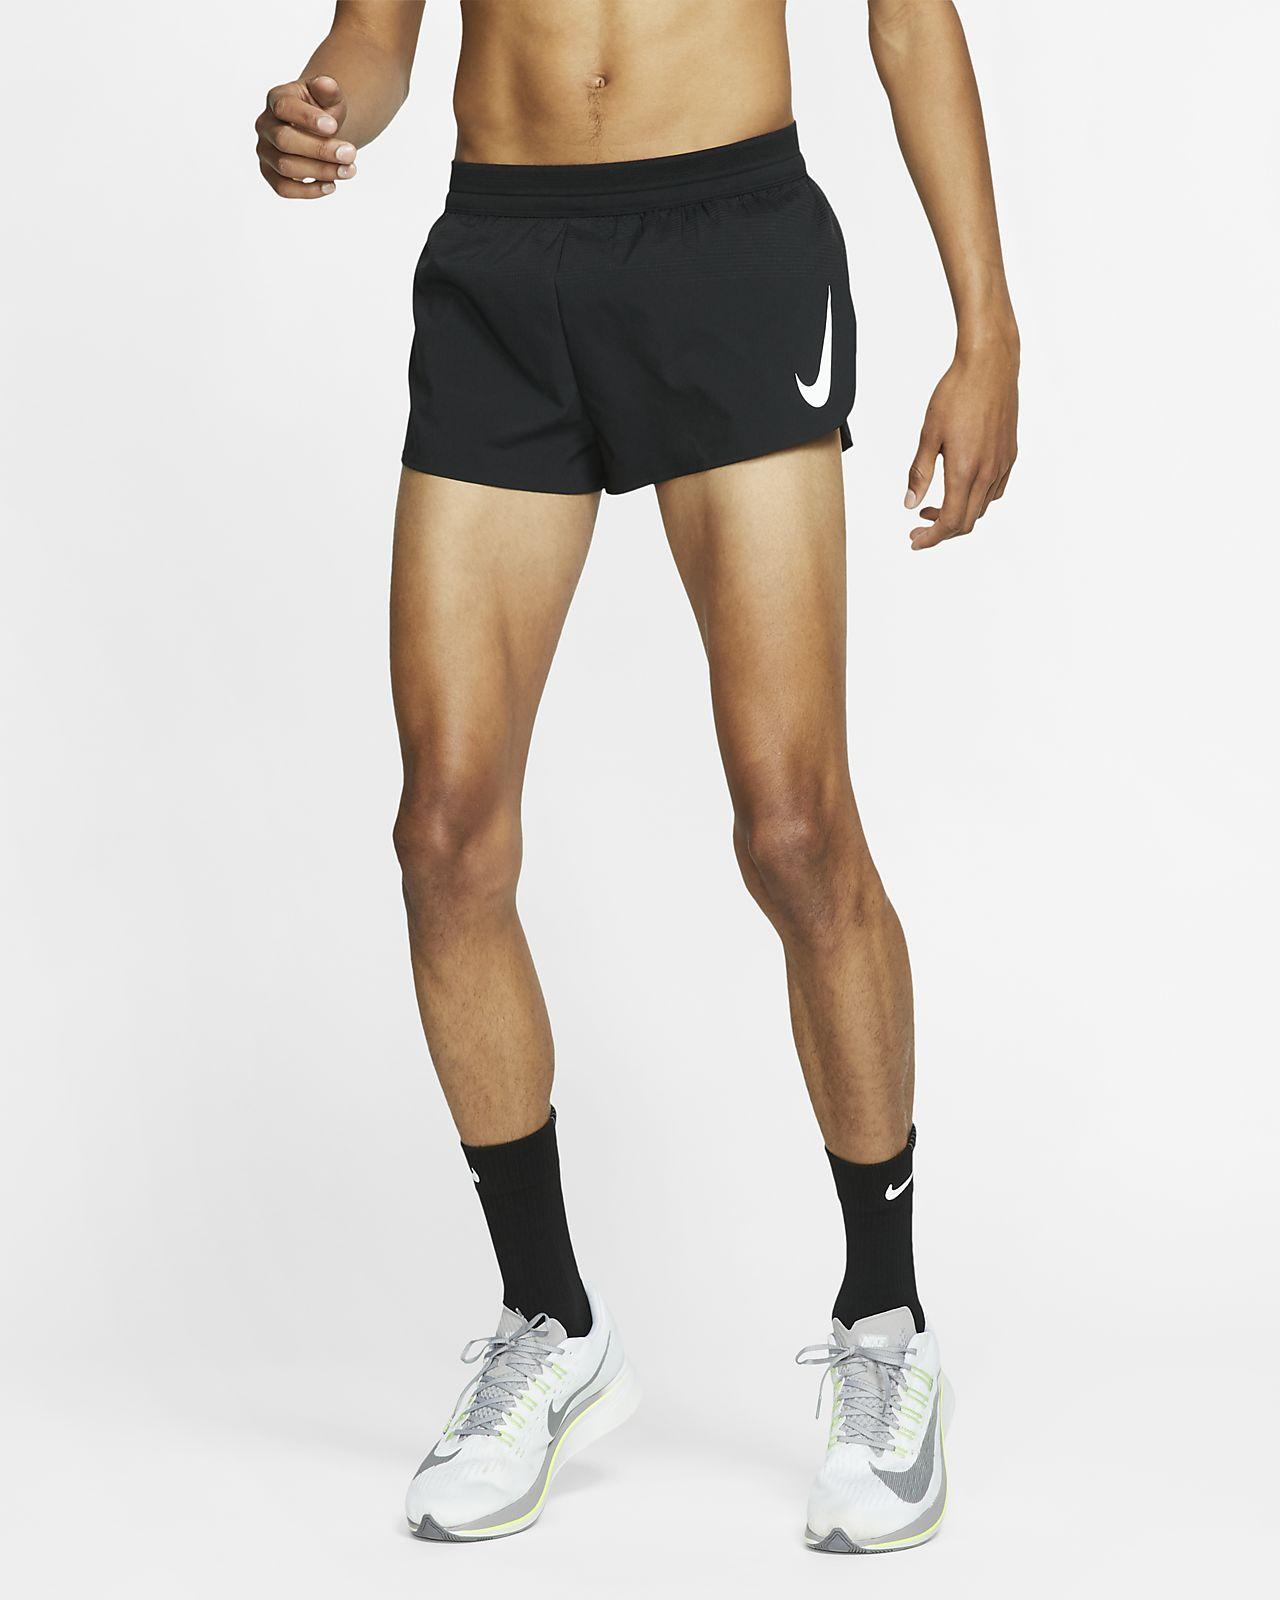 Nike AeroSwift (London)-løbeshorts (5 cm) til mænd